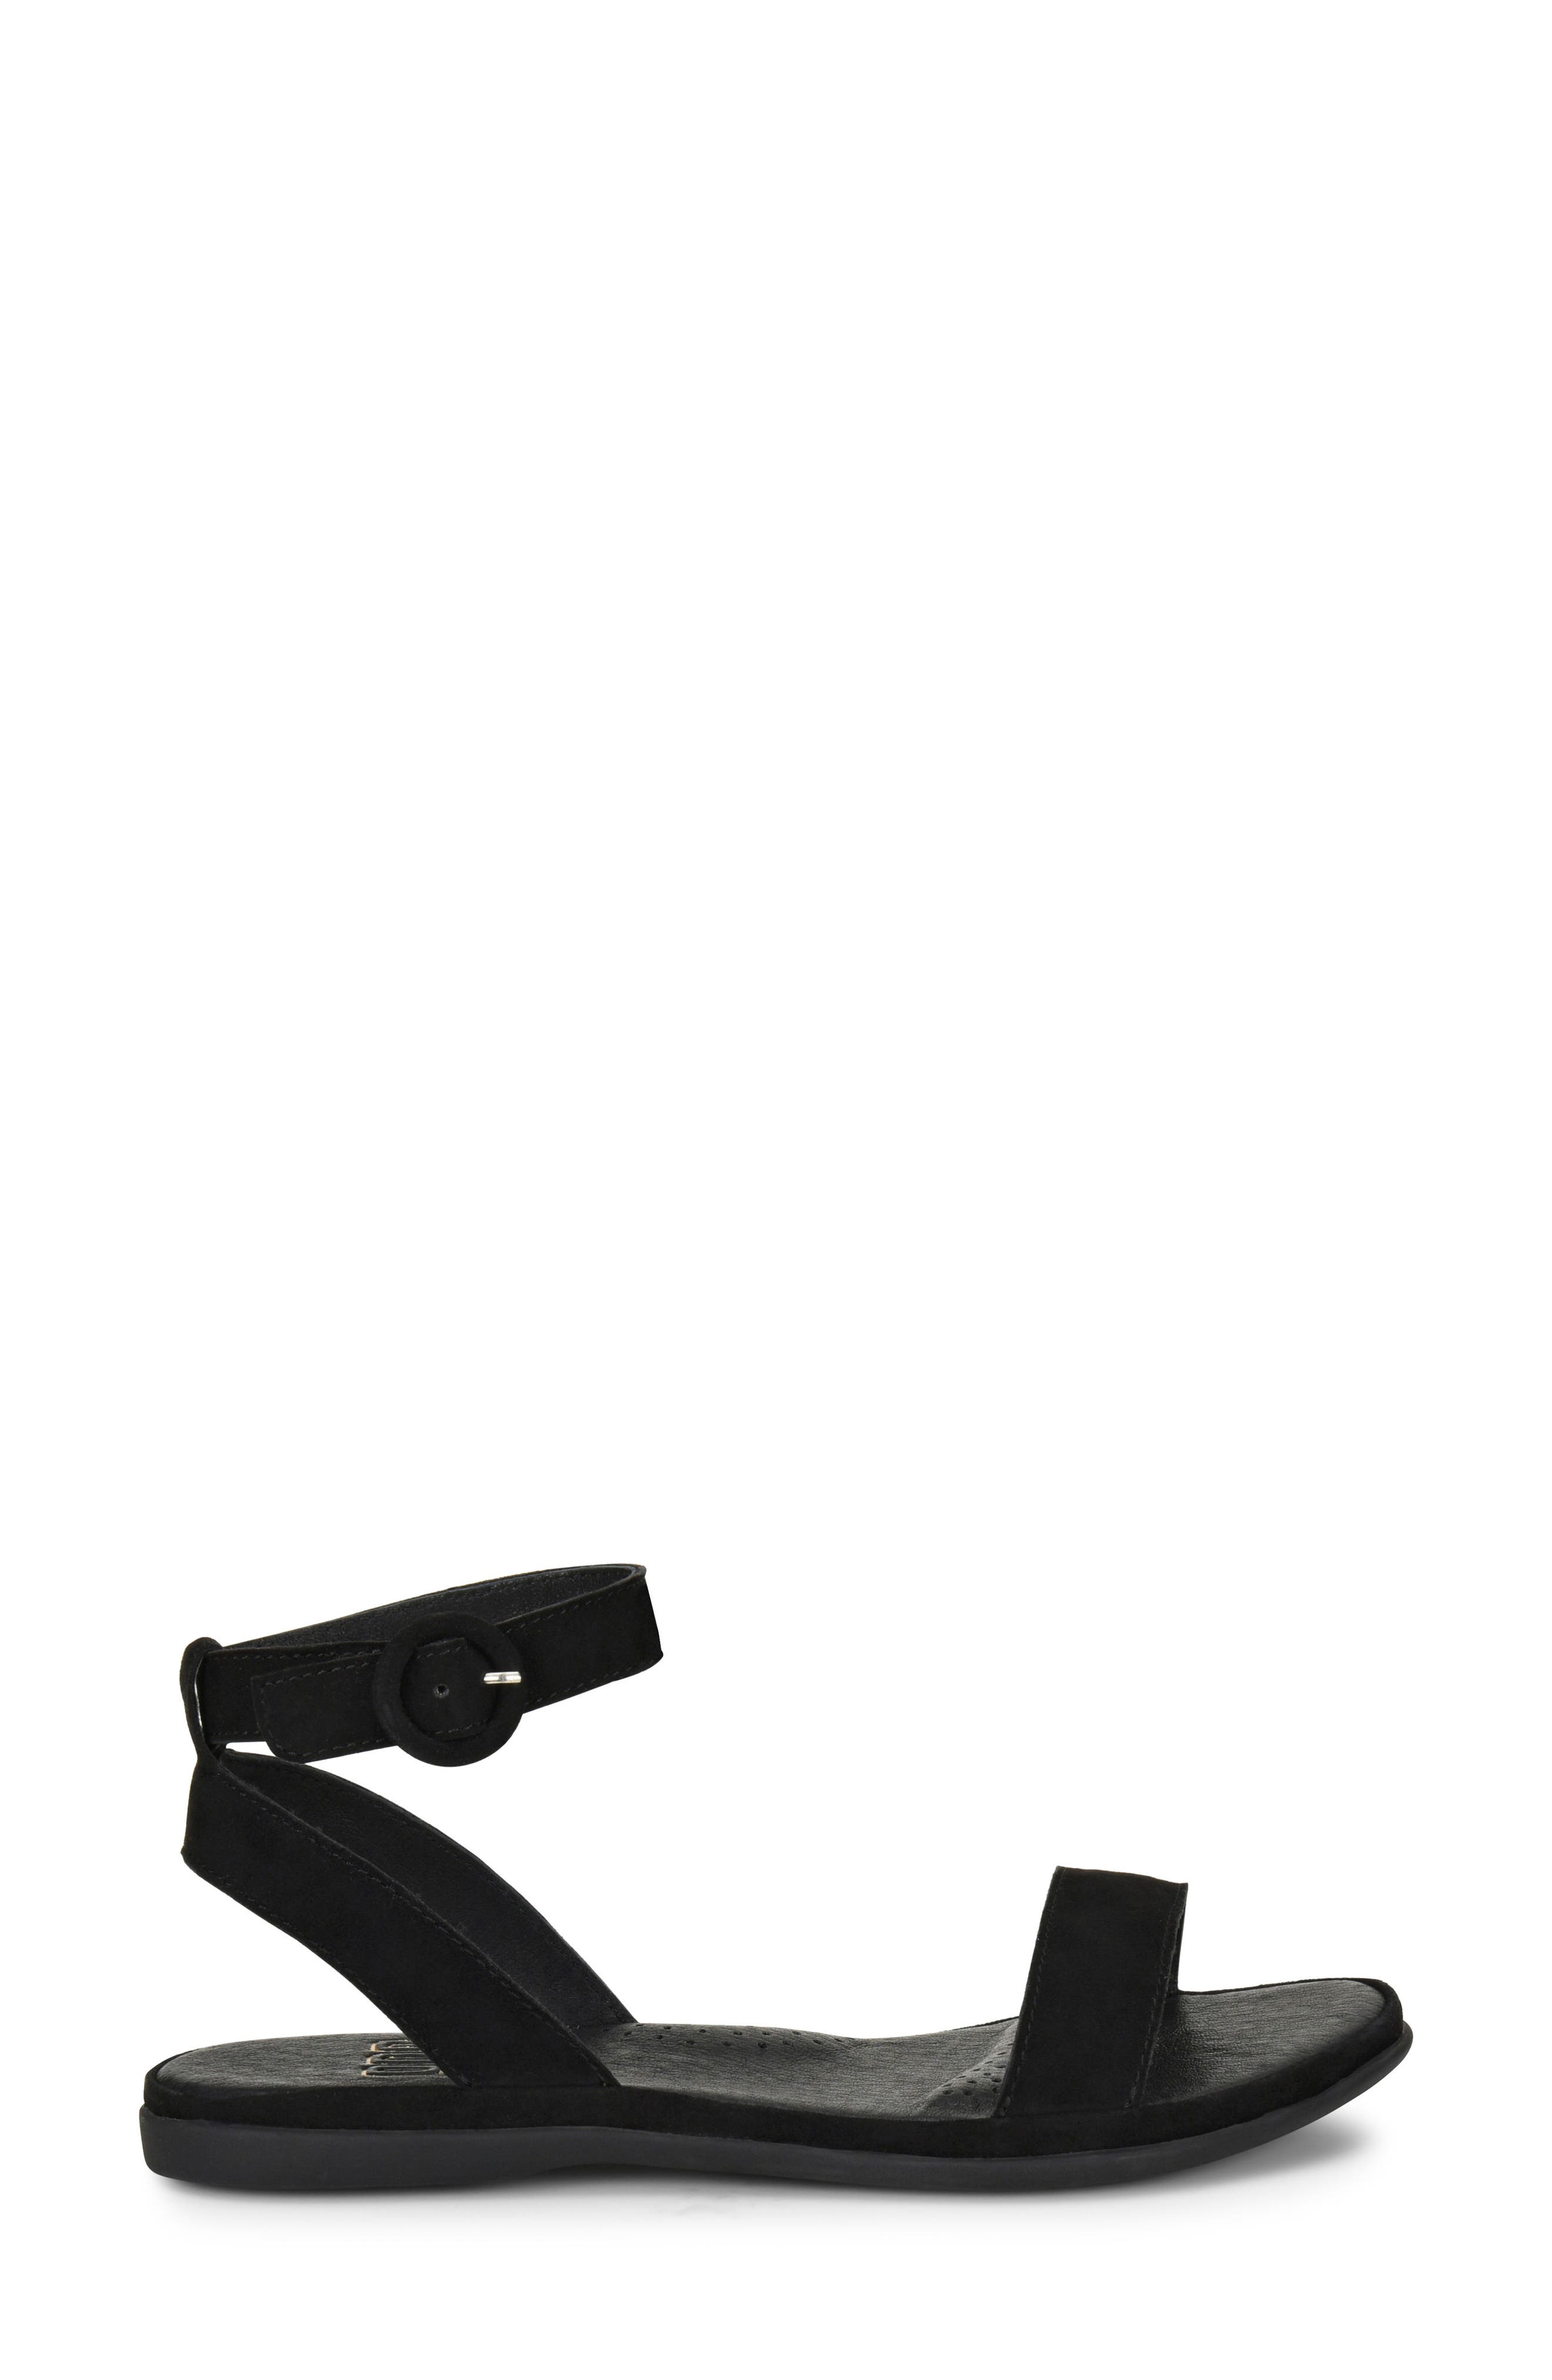 Stellan Sandal,                             Alternate thumbnail 3, color,                             BLACK SUEDE